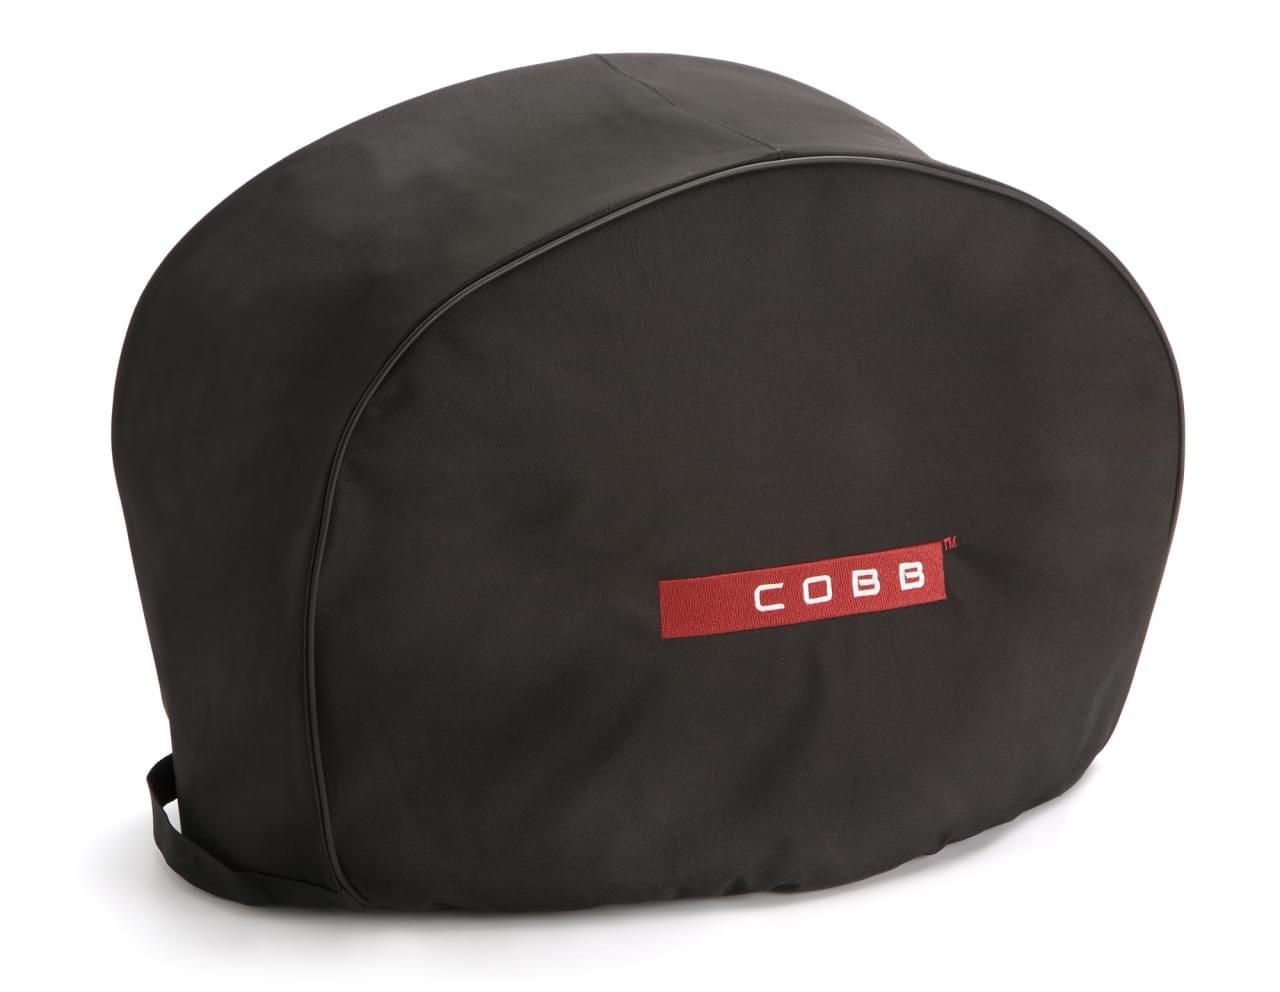 Cobb Supreme beschermhoes